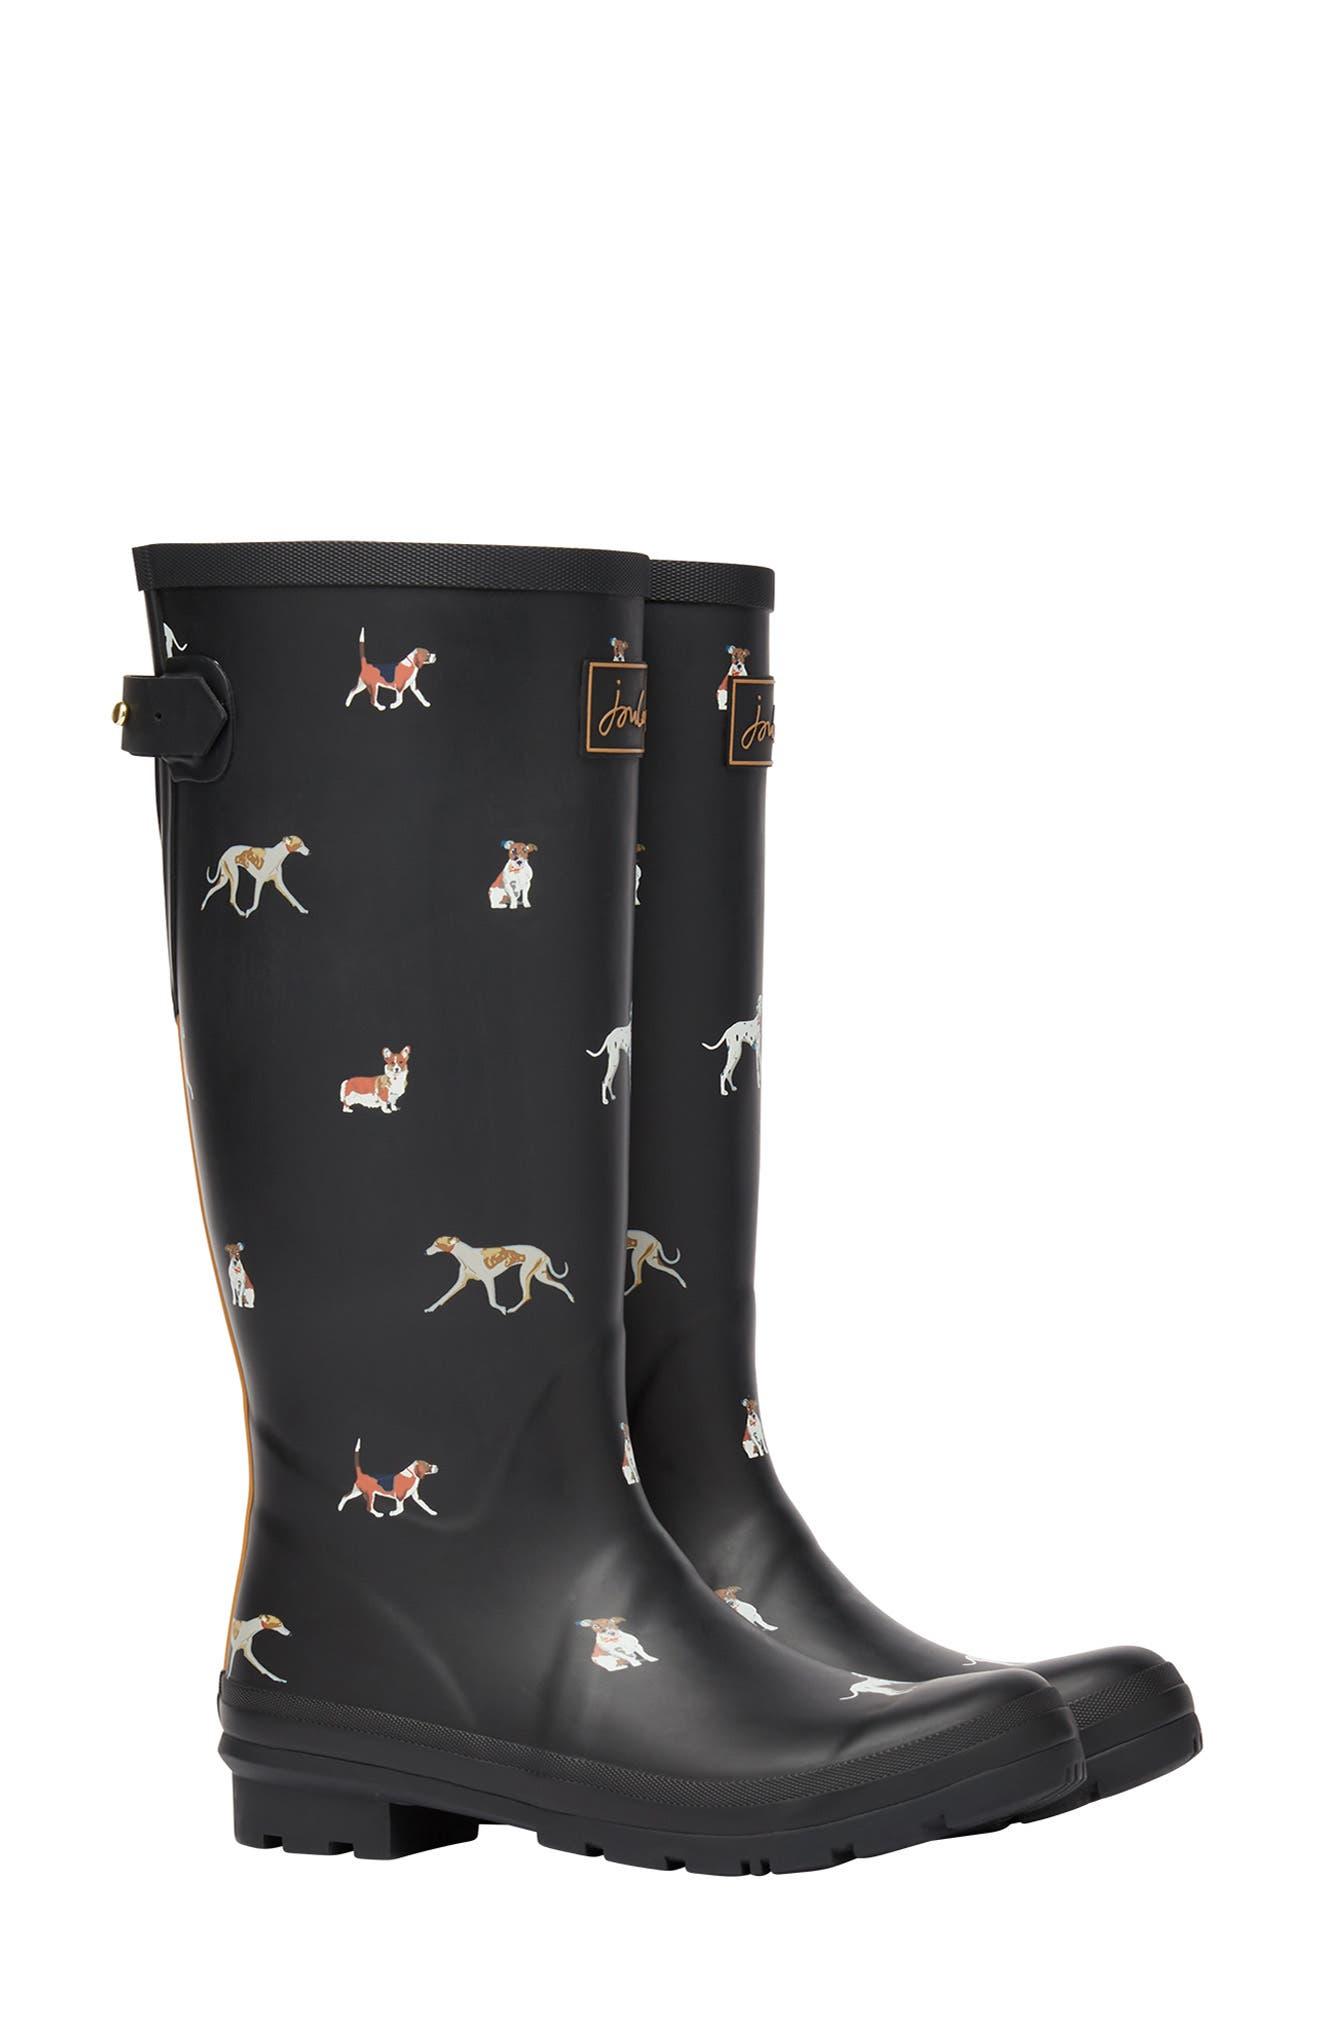 Welly Print Waterproof Rain Boot